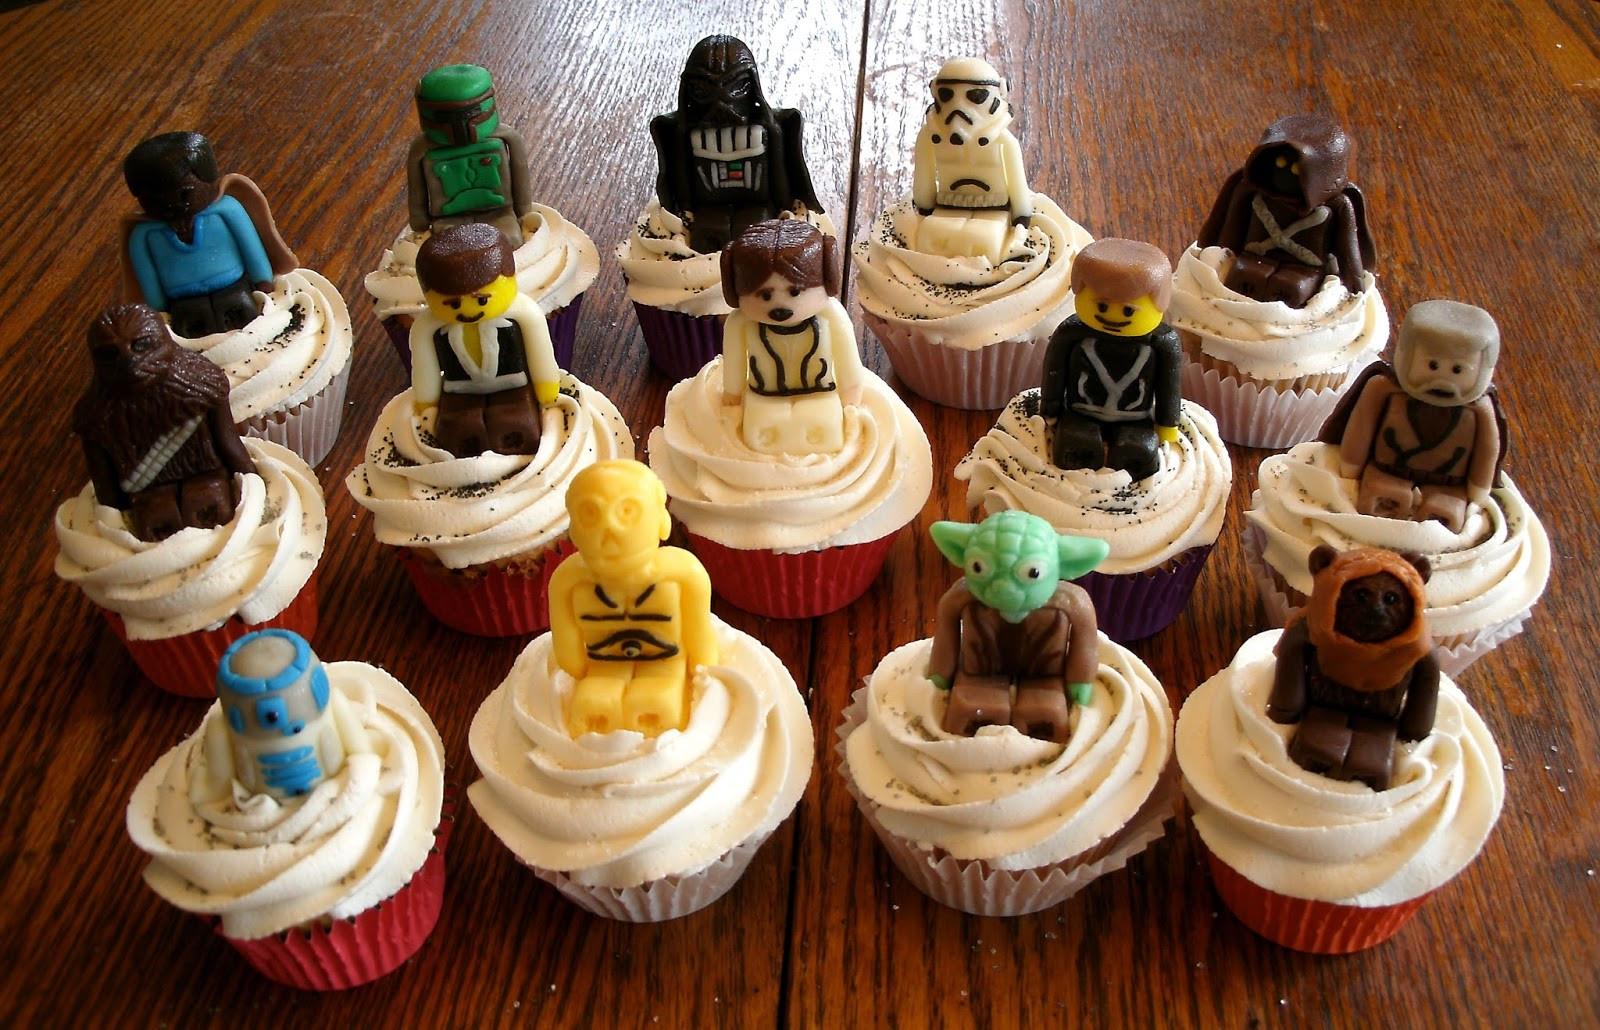 Star Wars Cupcakes  MuyAmeno Cupcakes de Star Wars 3